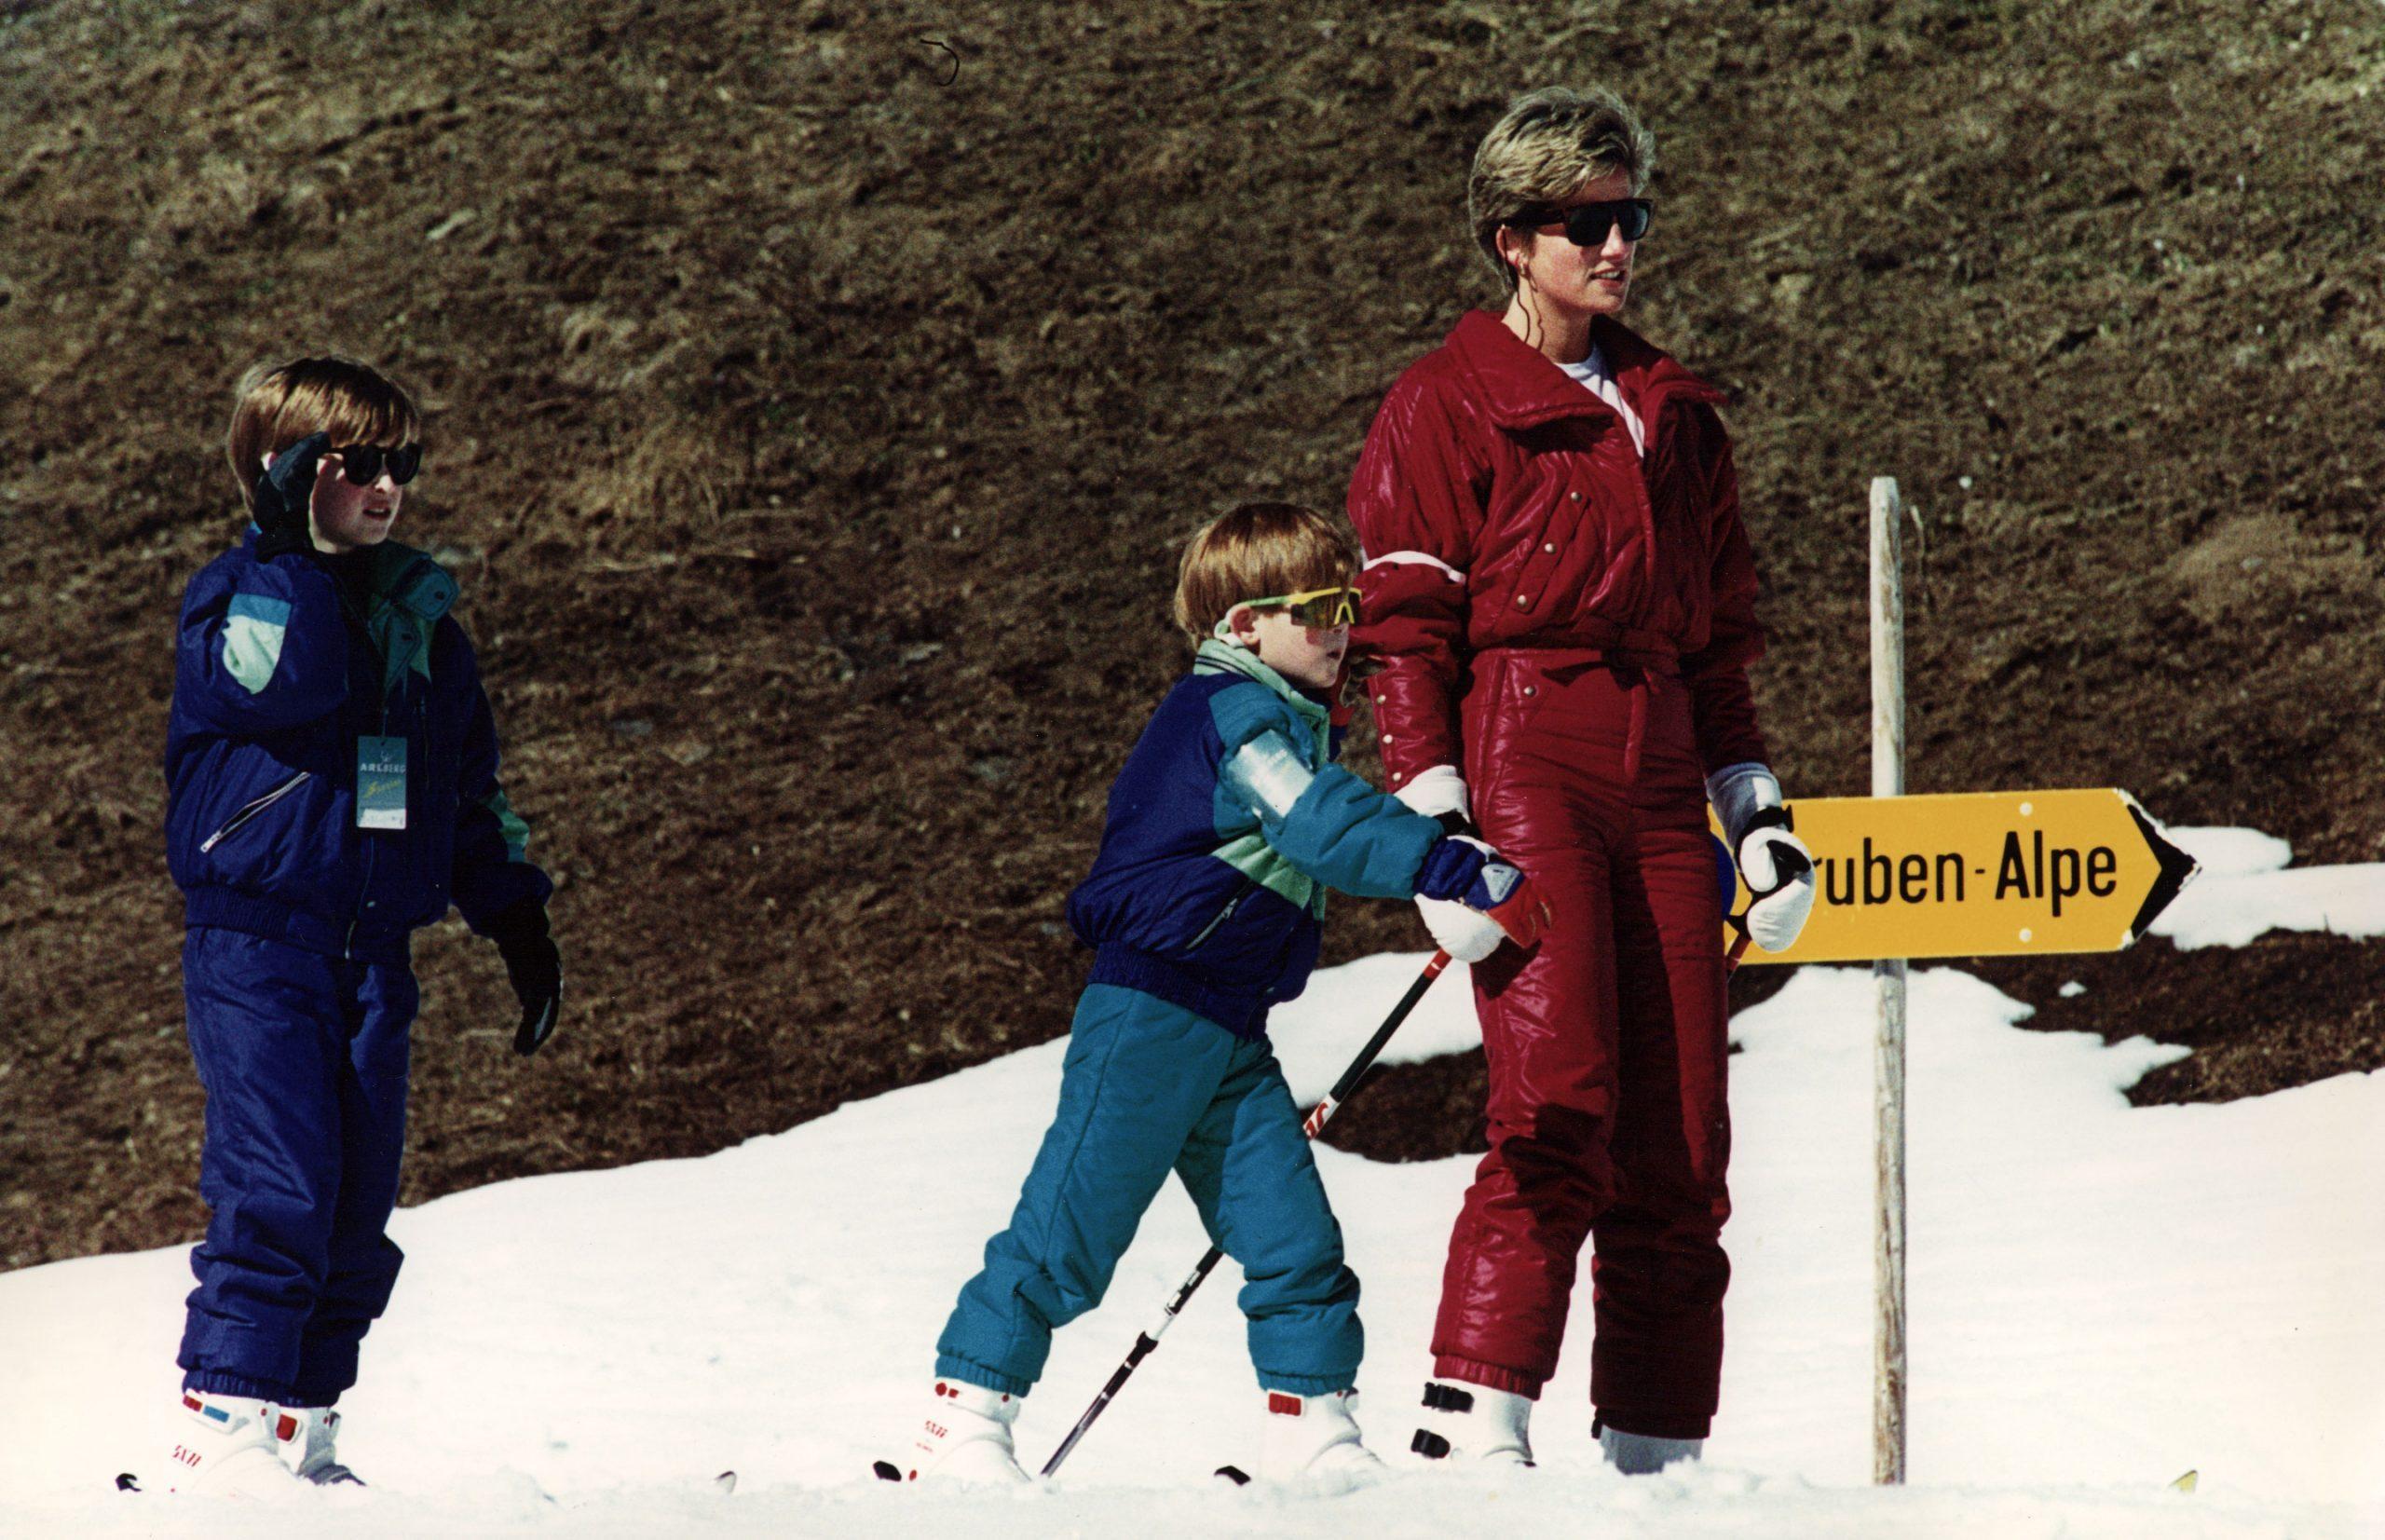 Diana Princess Of Wales Prince William Prince Harry Royal Family Ski-ing